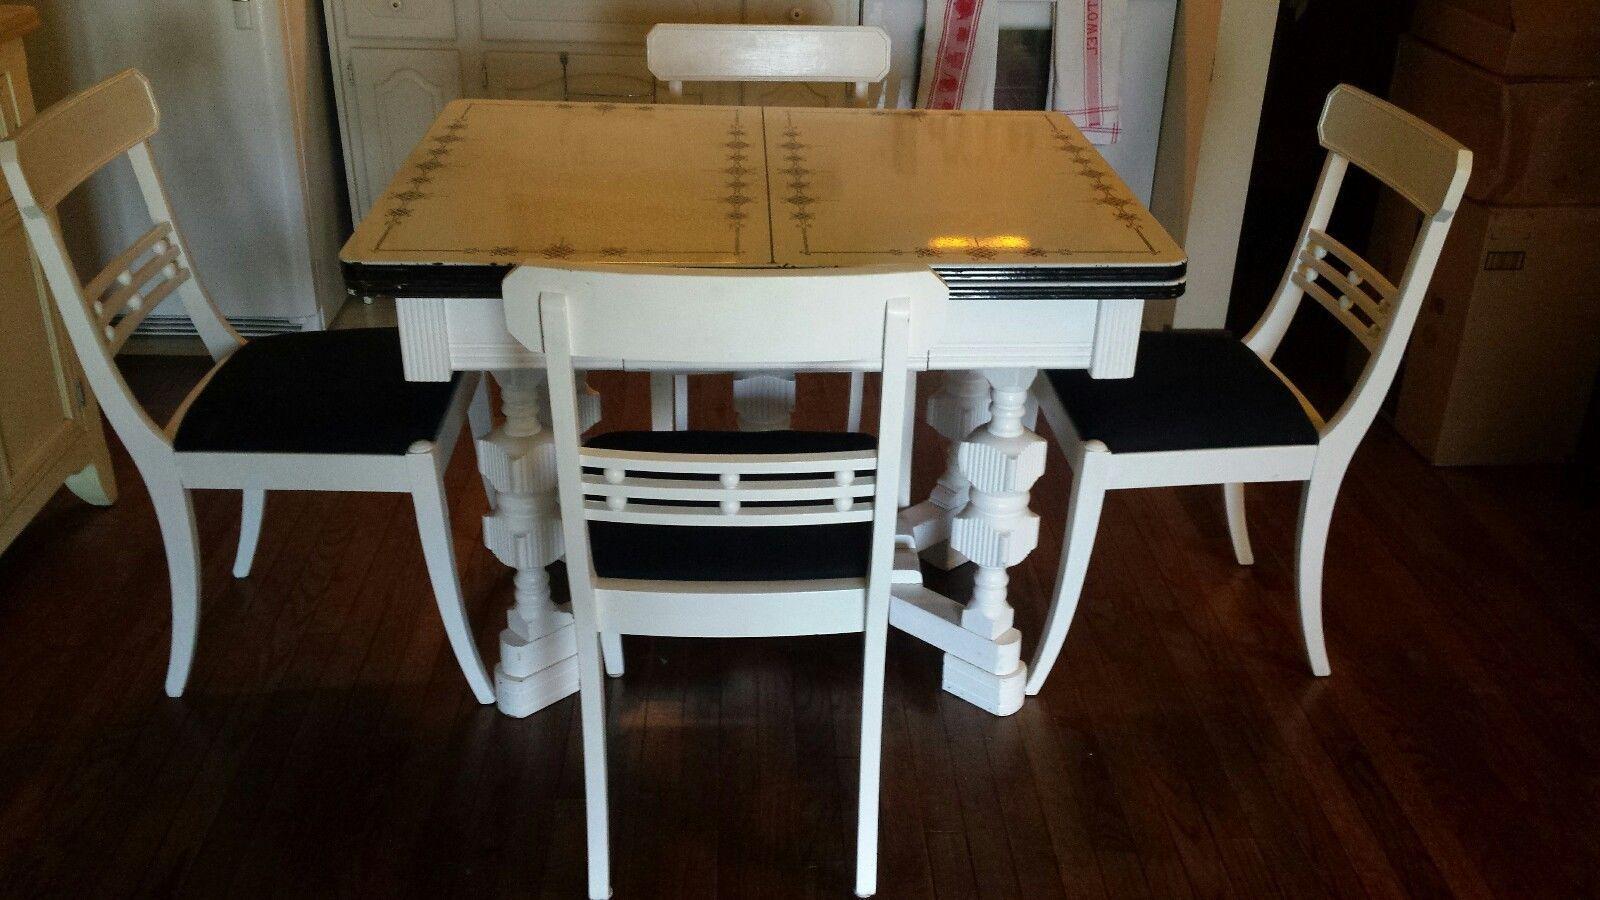 Beautiful Black U0026 White Enamel Top Table W/ Four Chairs 1930s   40s | EBay